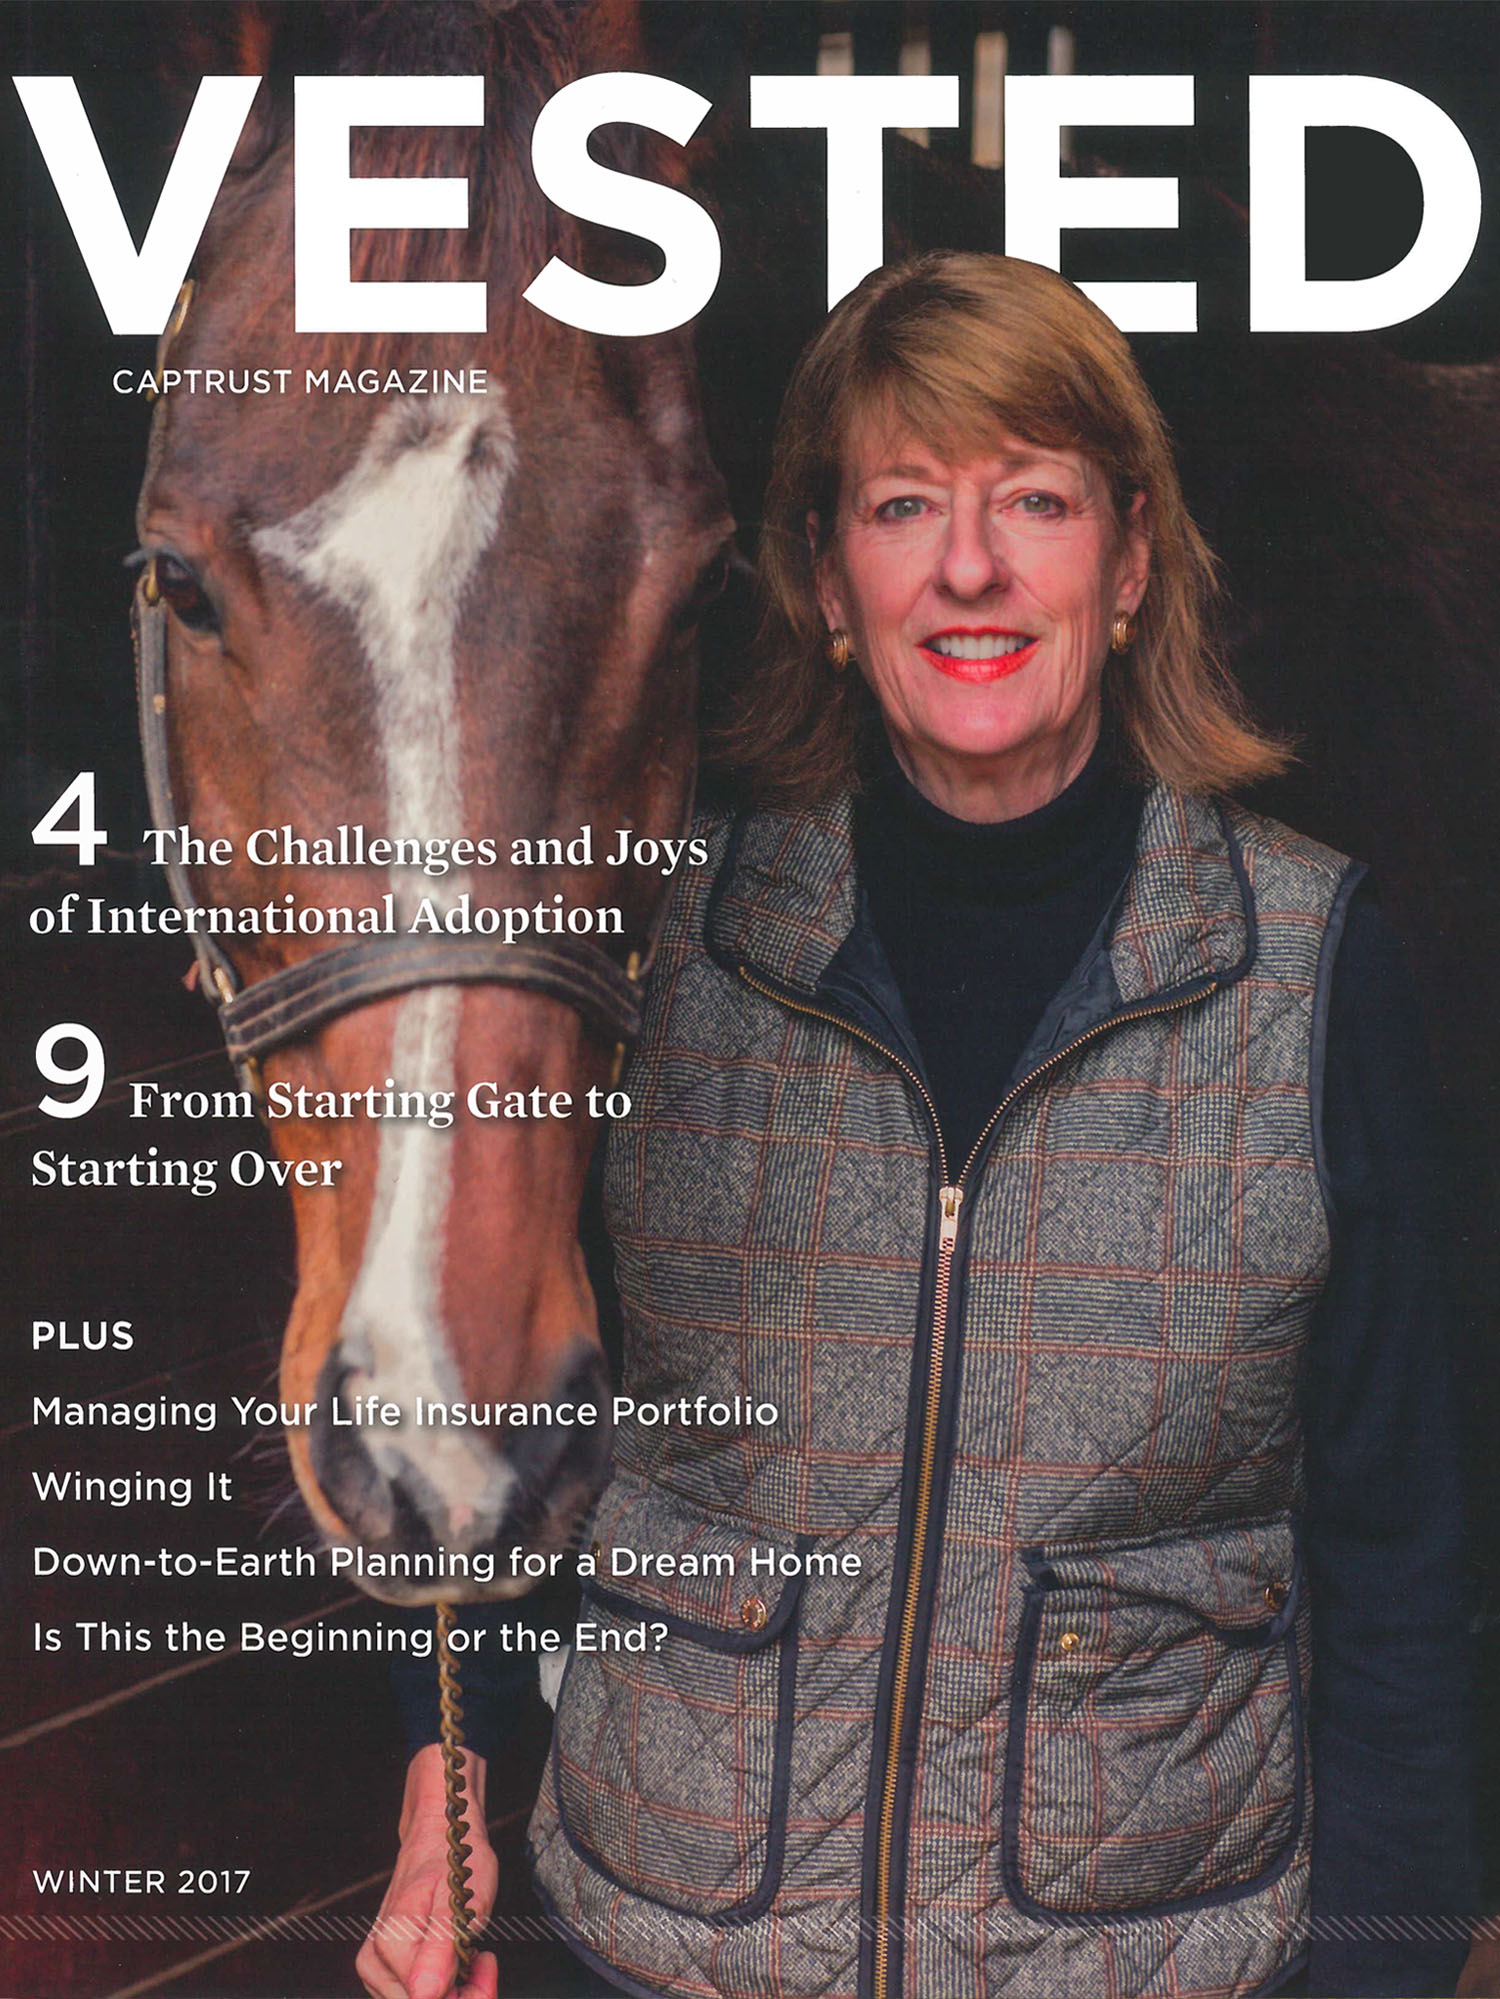 Vested Captrust Magazine -